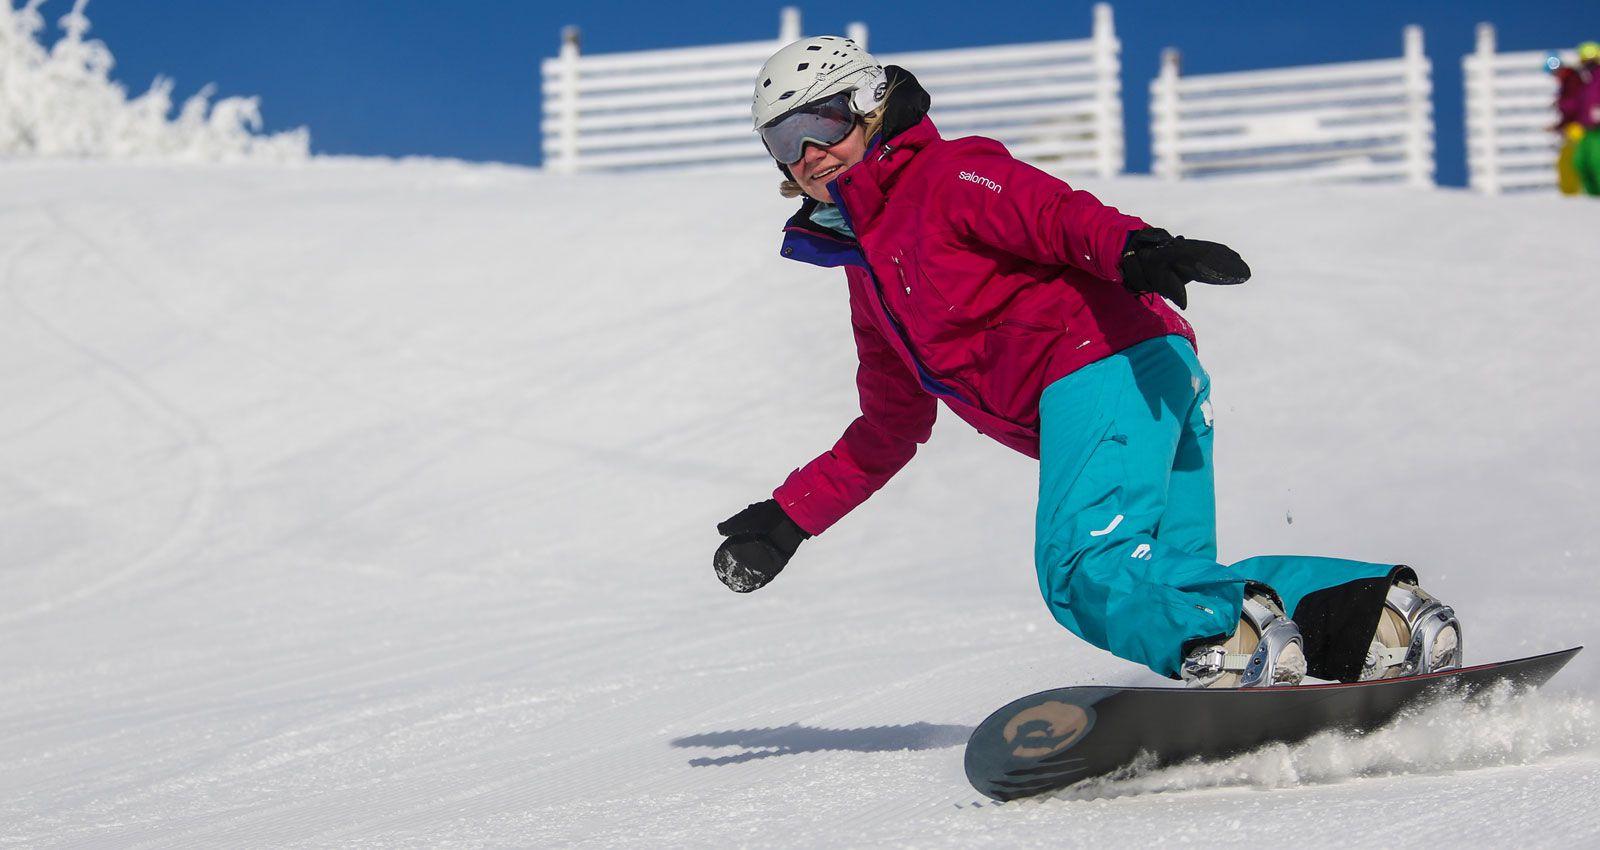 Snow skiing terms